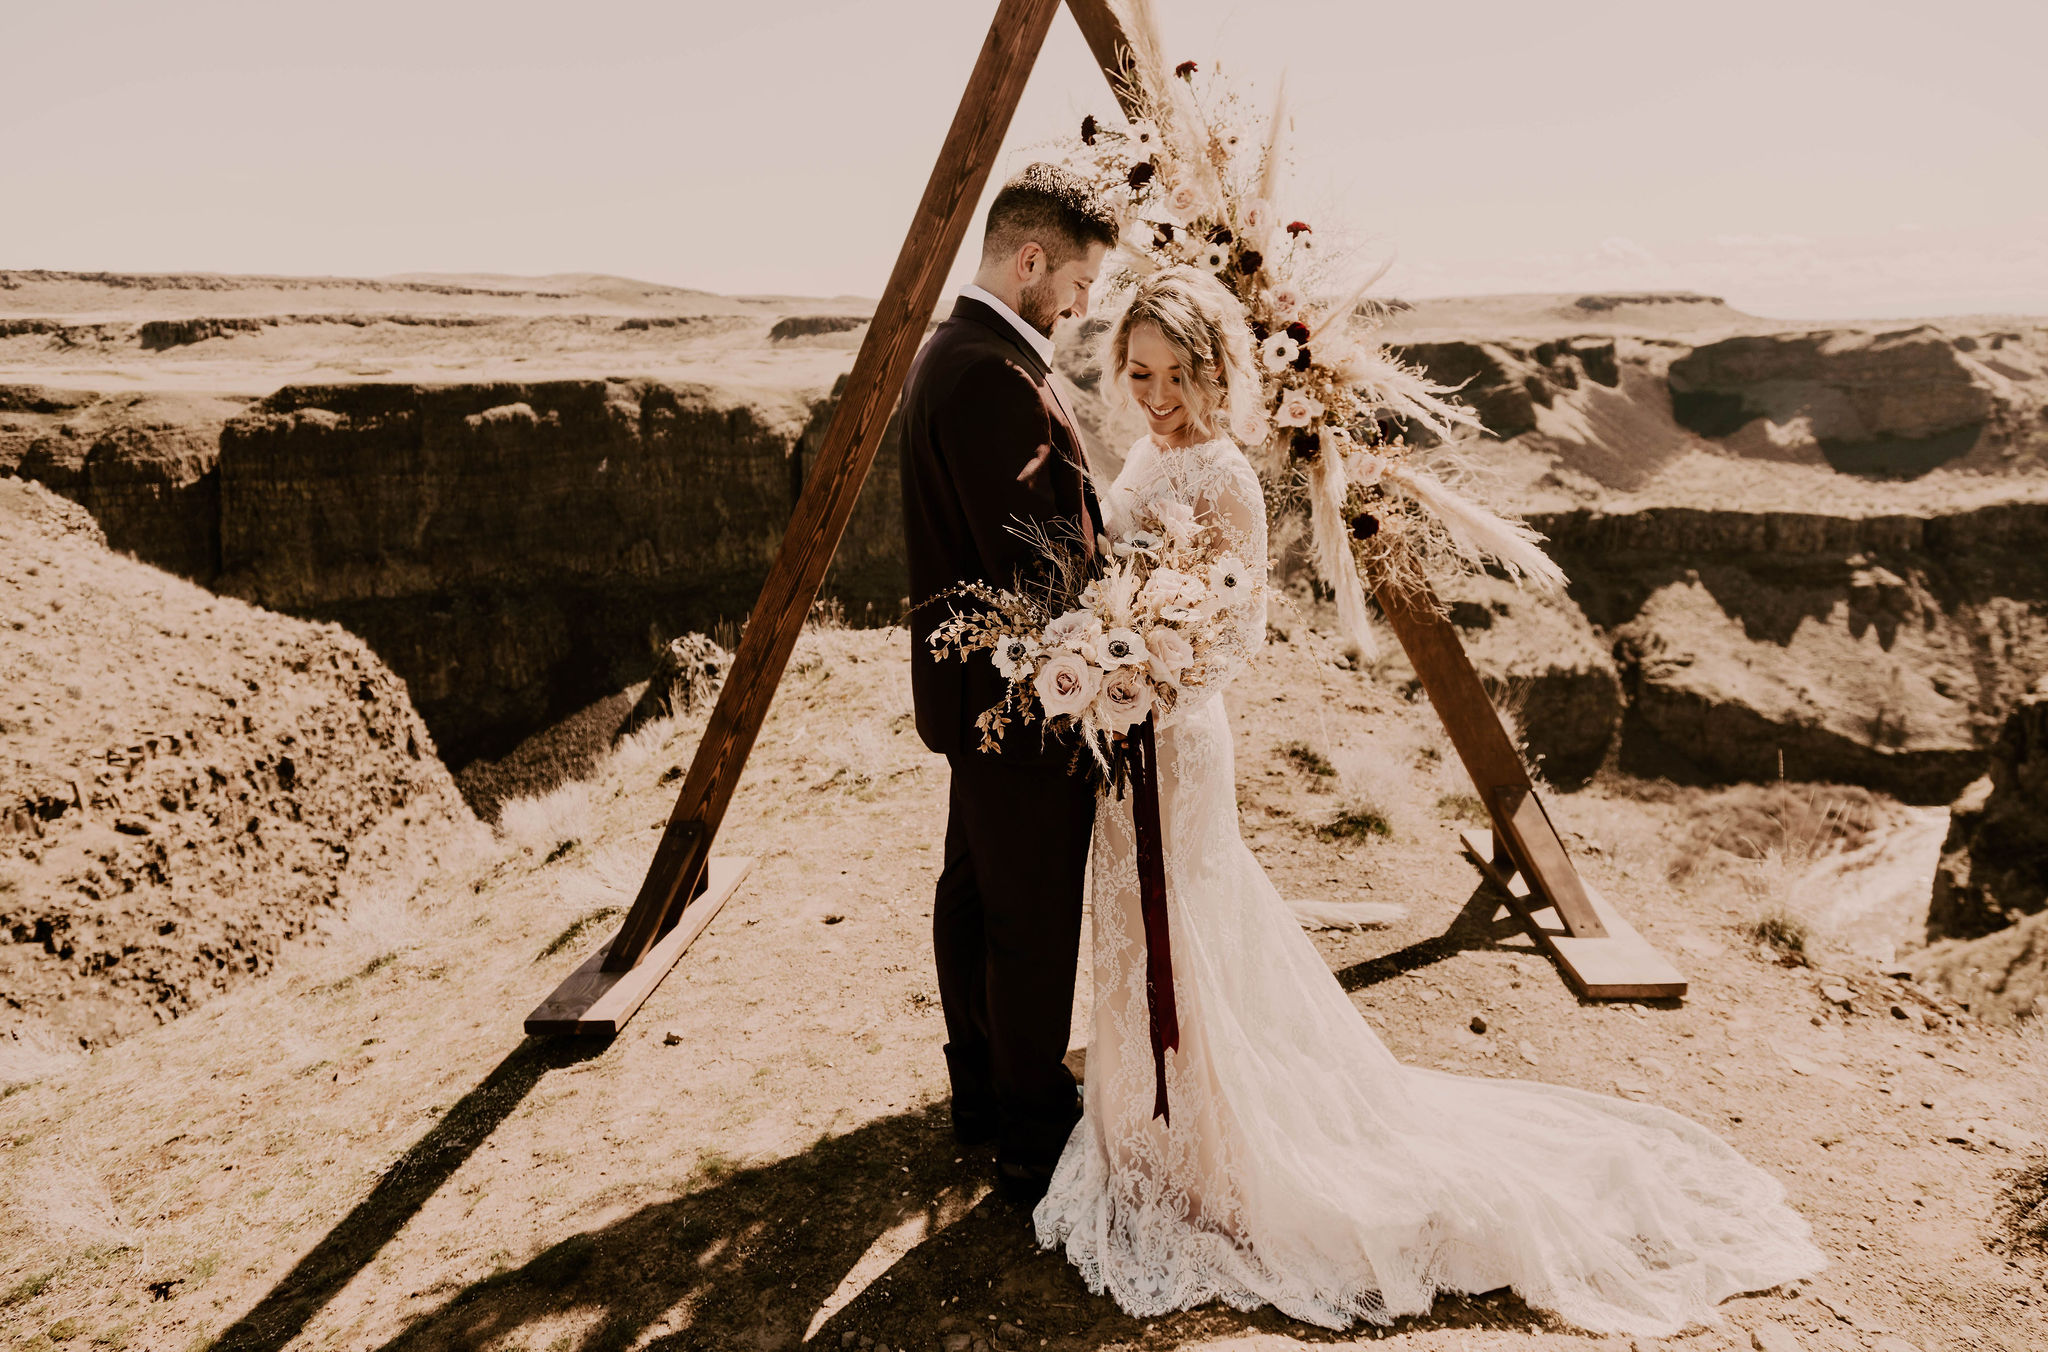 spokane summer bride honest in ivory gown